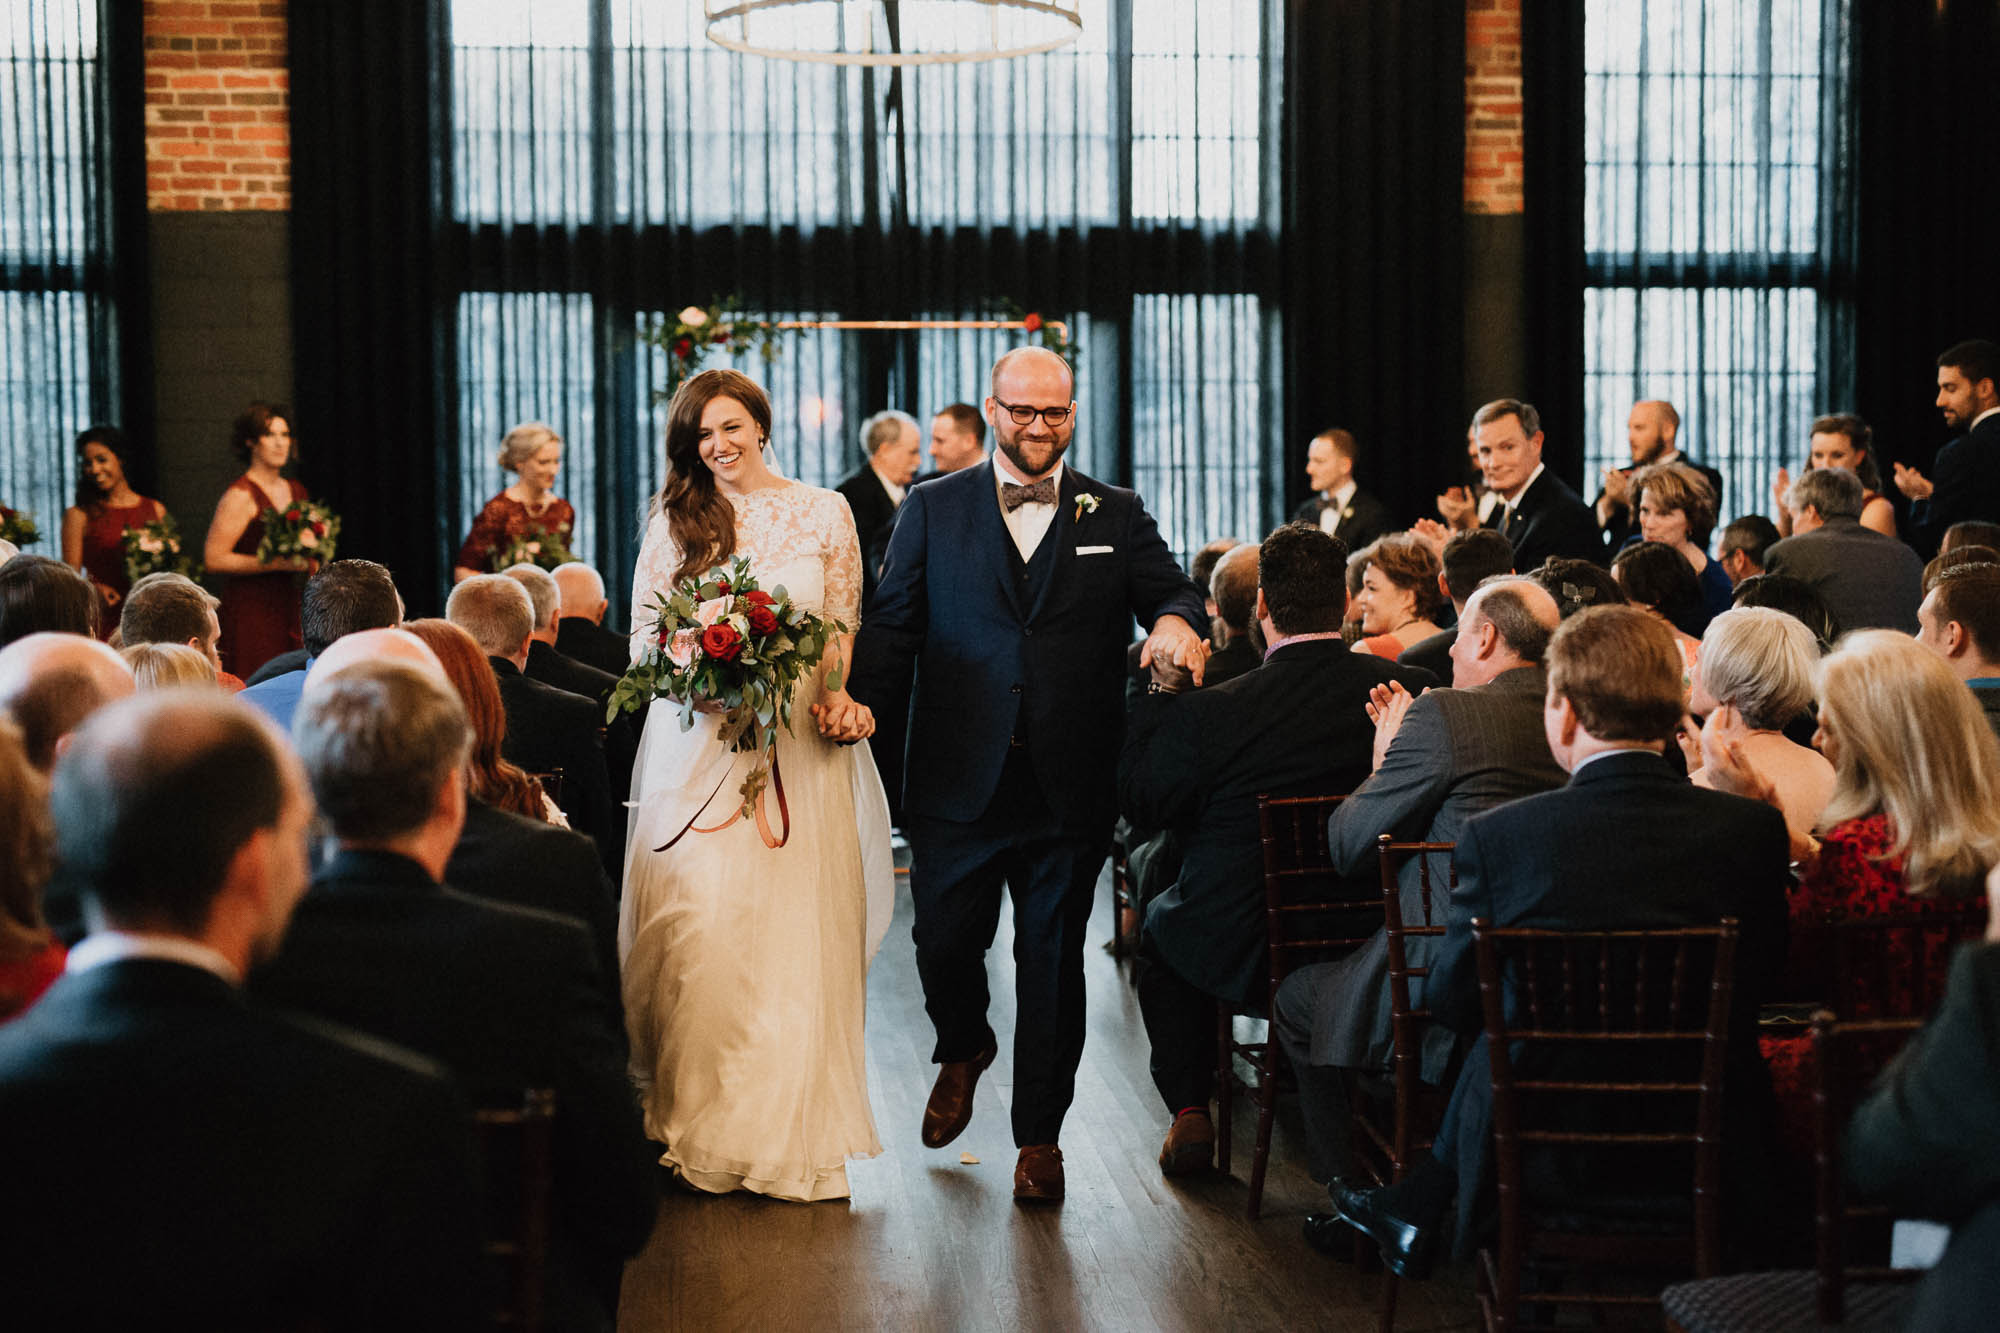 Highline-Car-House-Wedding-Columbus-Kristin-Aaron-084.jpg